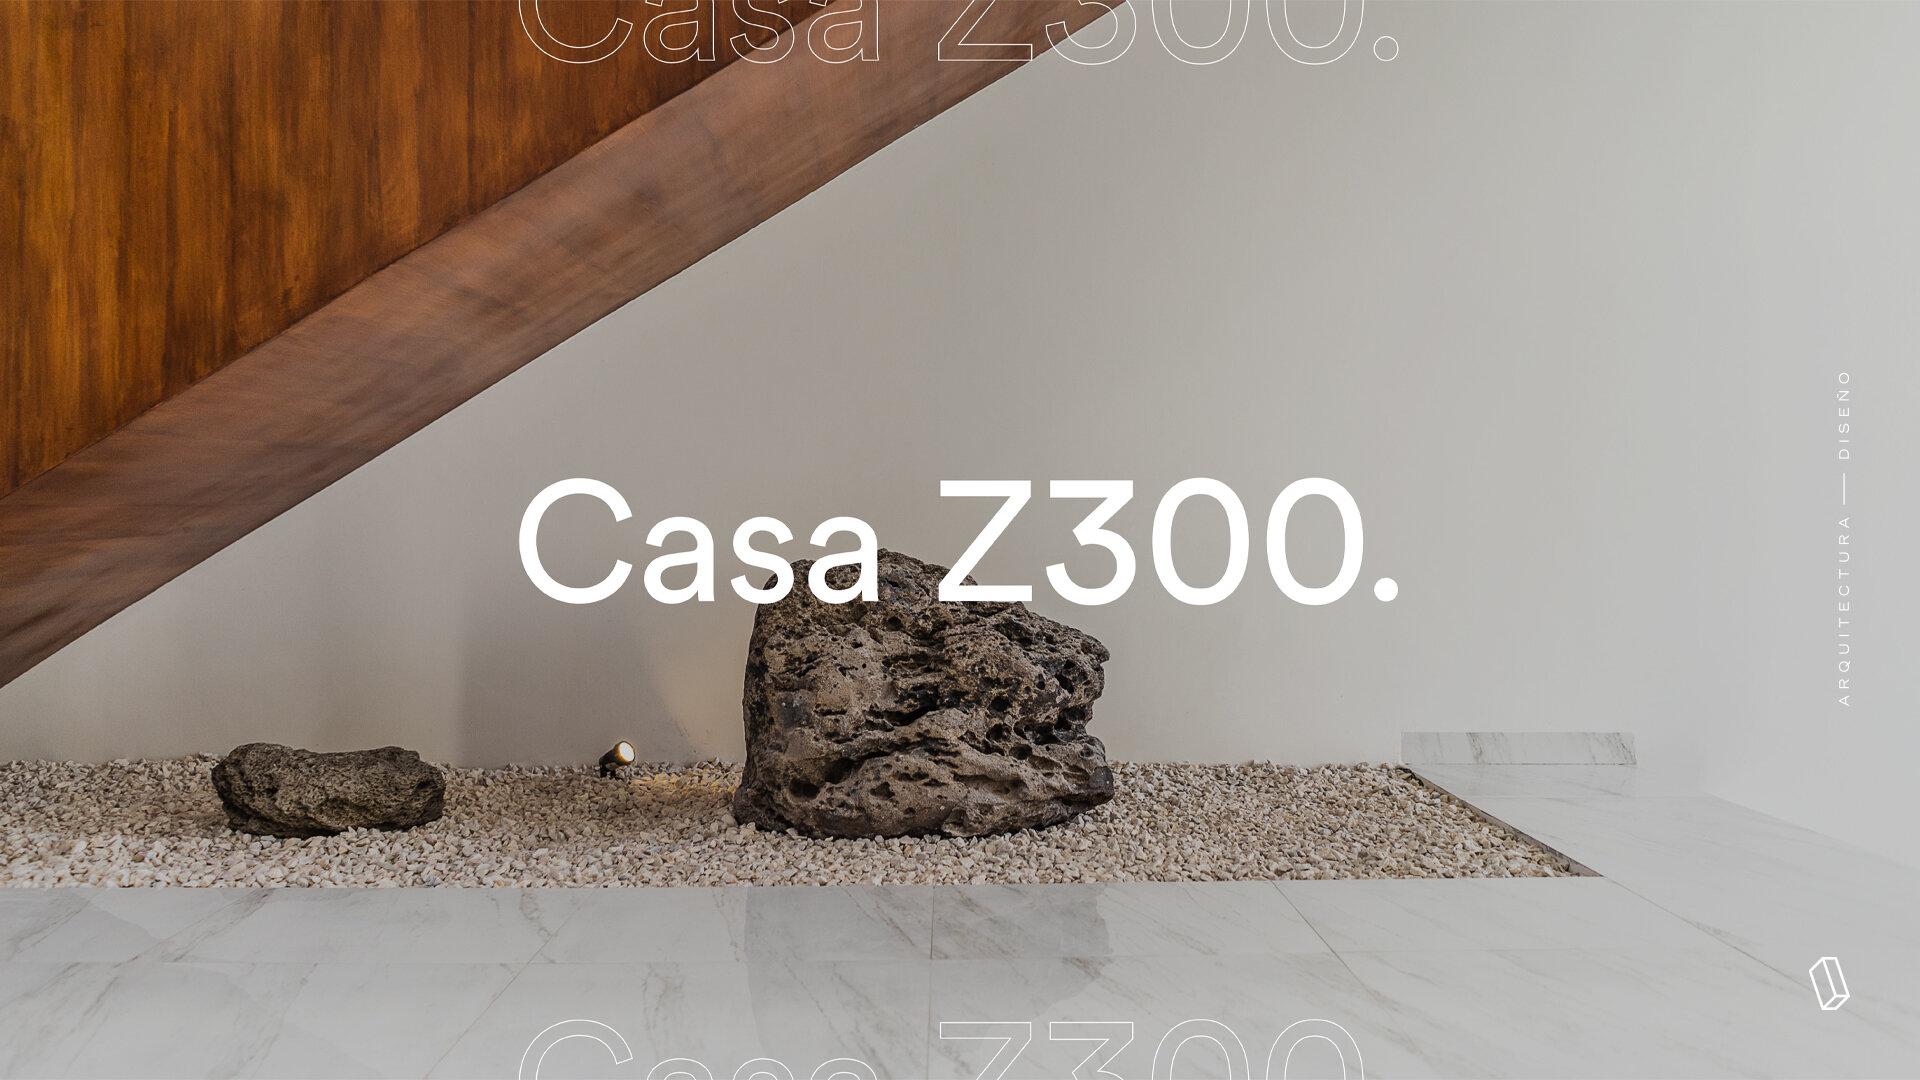 02.CasaOpuntia_Tenter_Proyectos.jpg